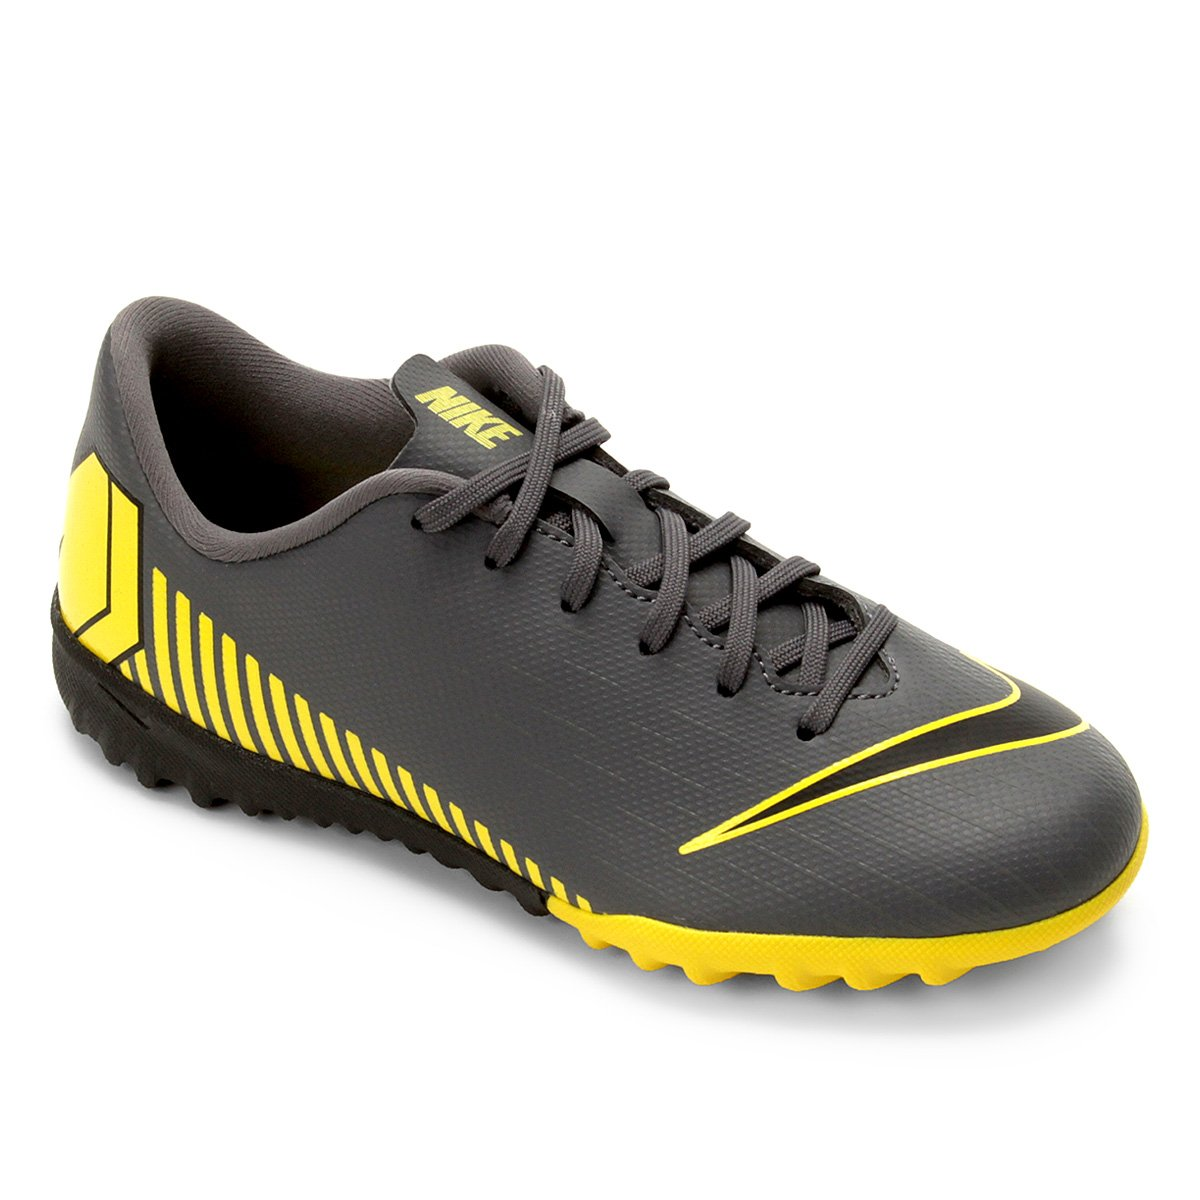 ecfde2b938fce Chuteira Society Infantil Nike Mercurial Vapor 12 Academy Gs TF - Cinza e  Amarelo | Loja do Inter